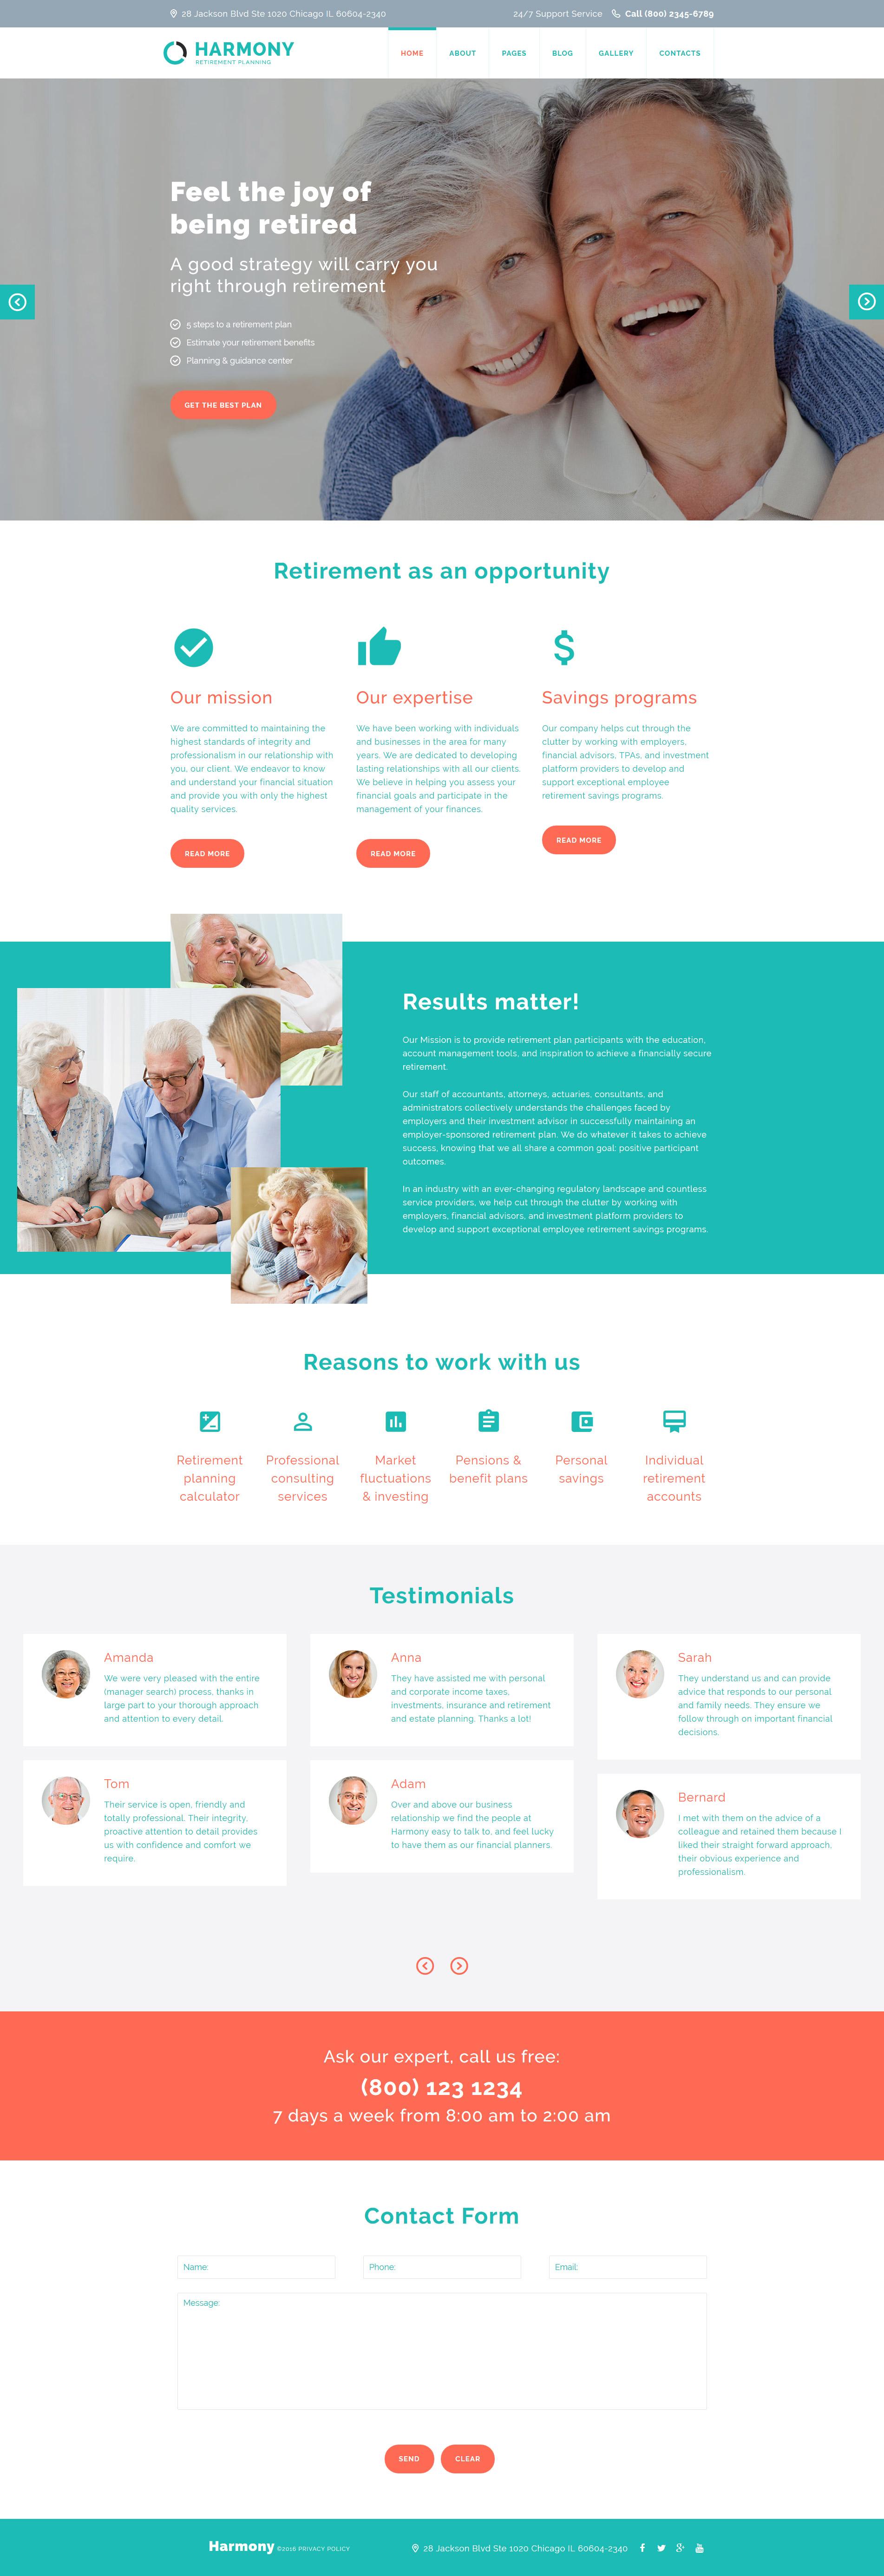 Harmony - Retirement Planning Joomla Template - screenshot